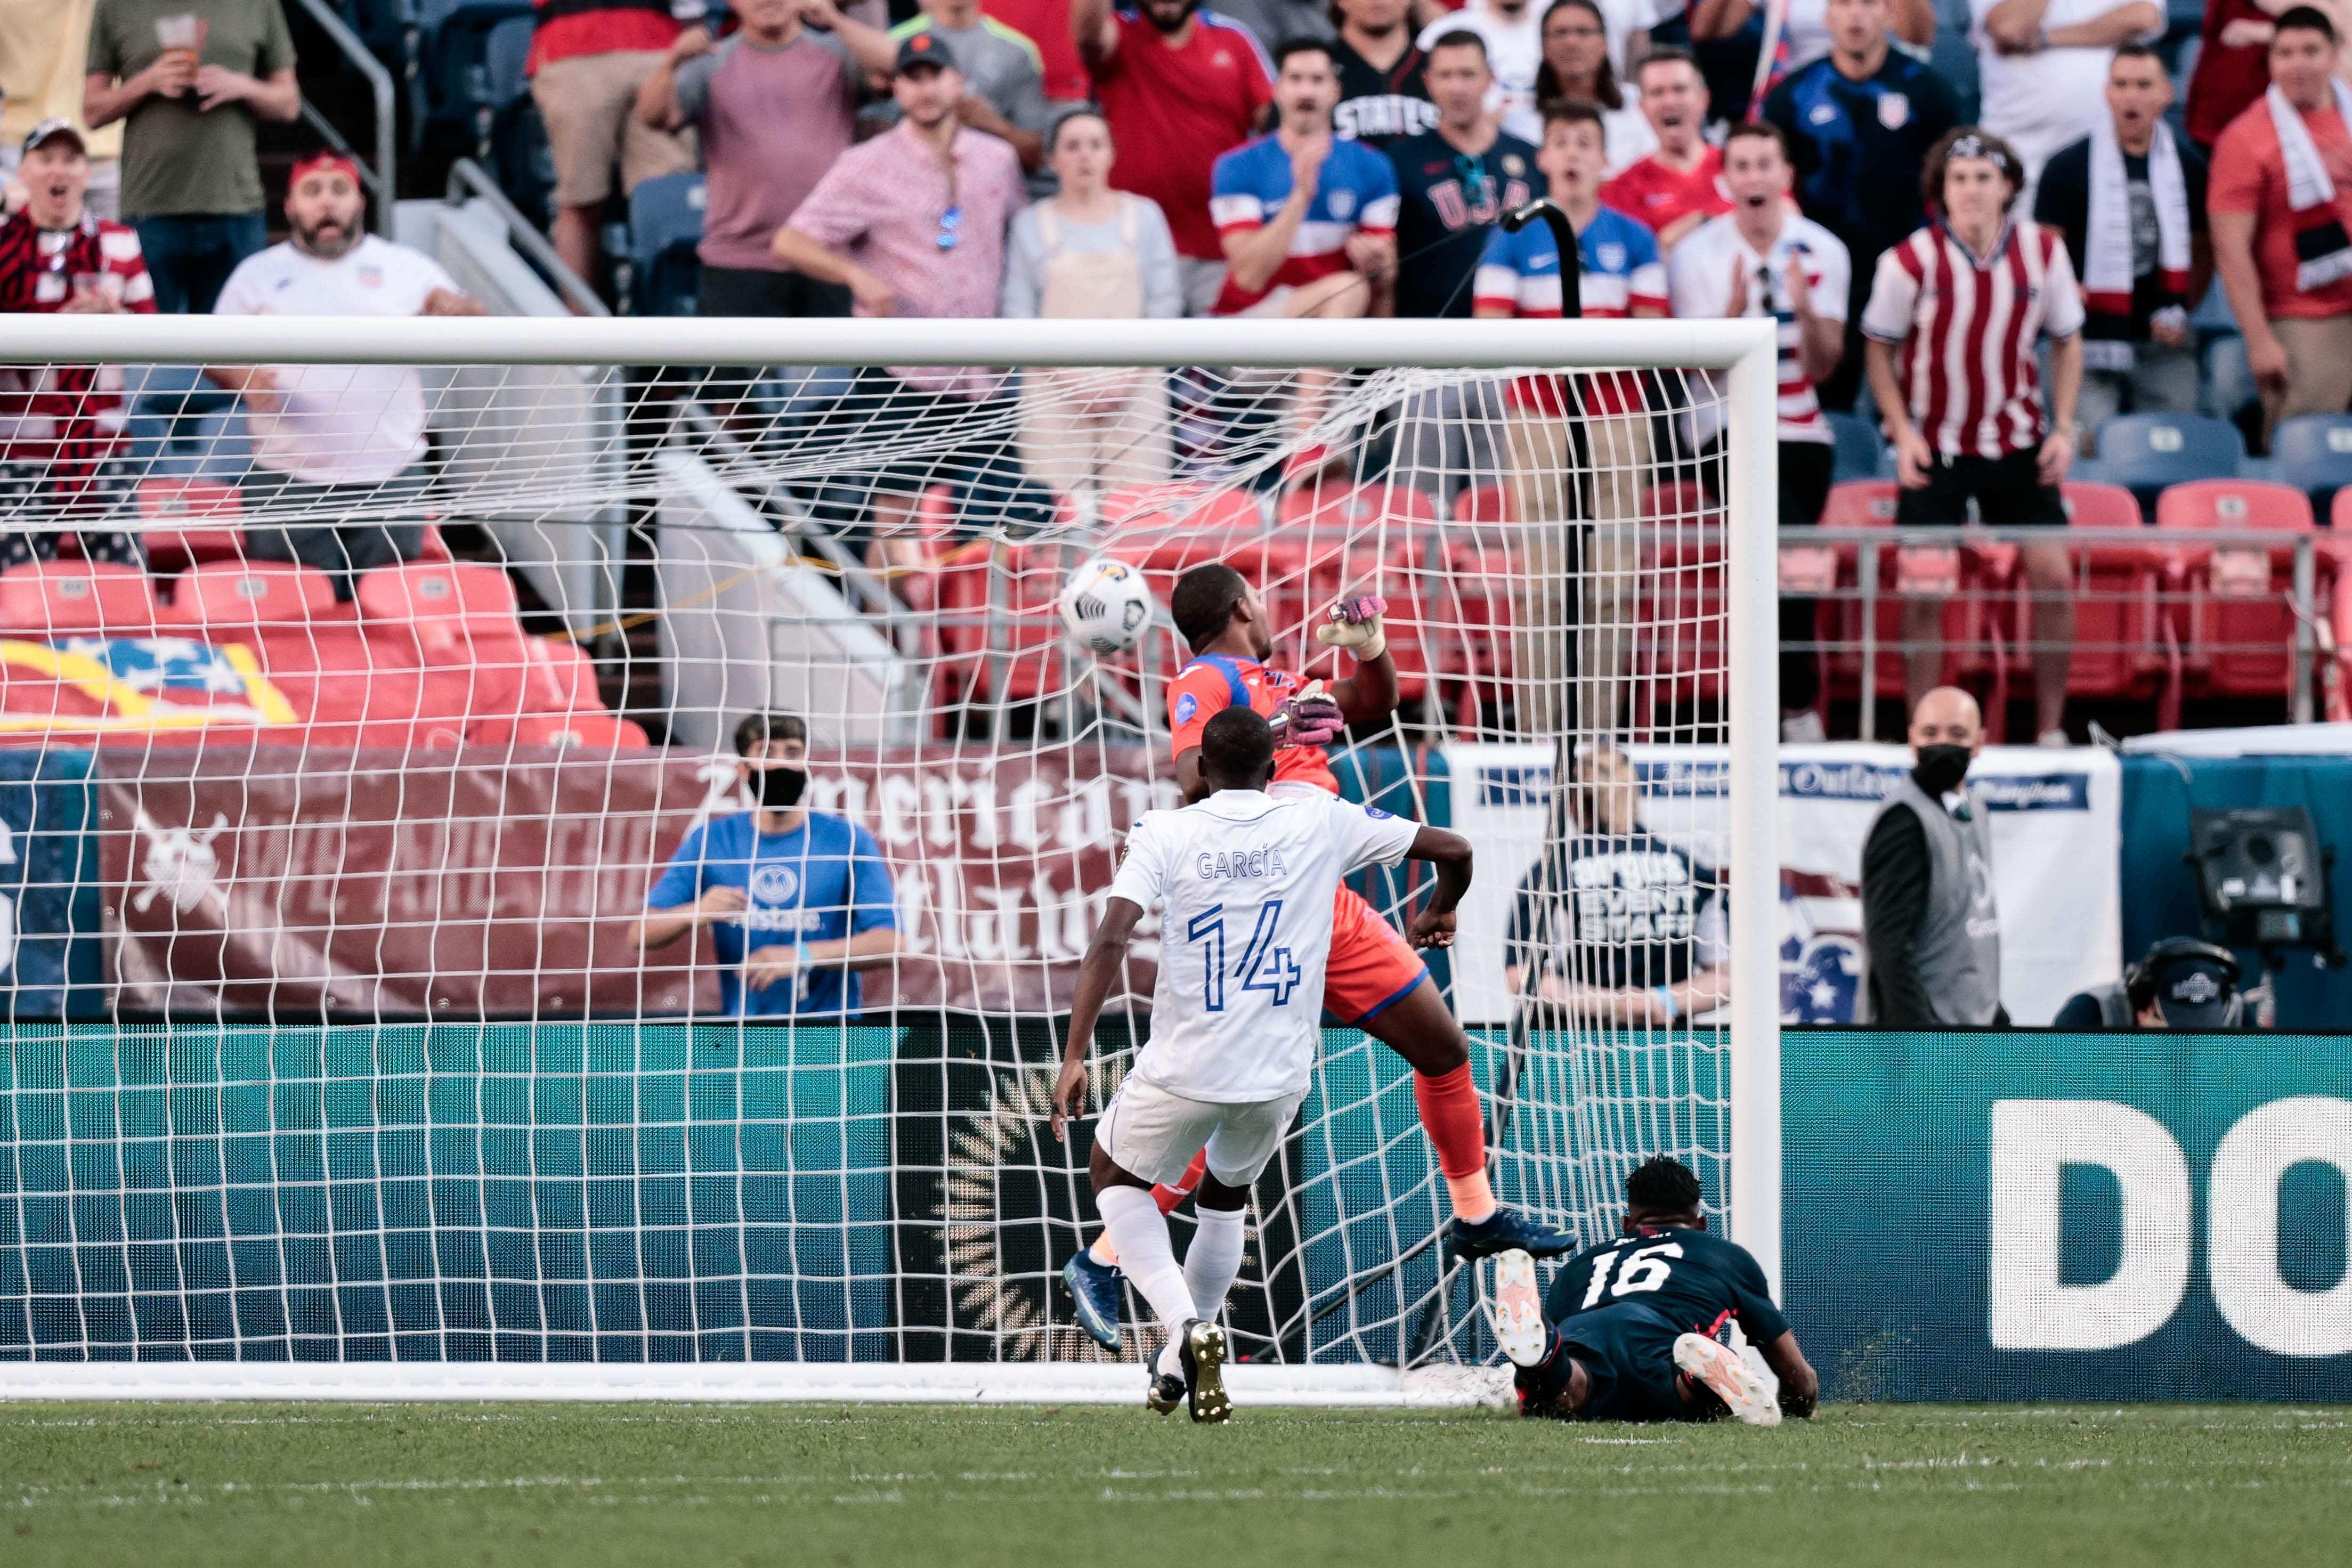 Soccer: 2021 Concacaf Nations League Semifinals-Honduras at USA